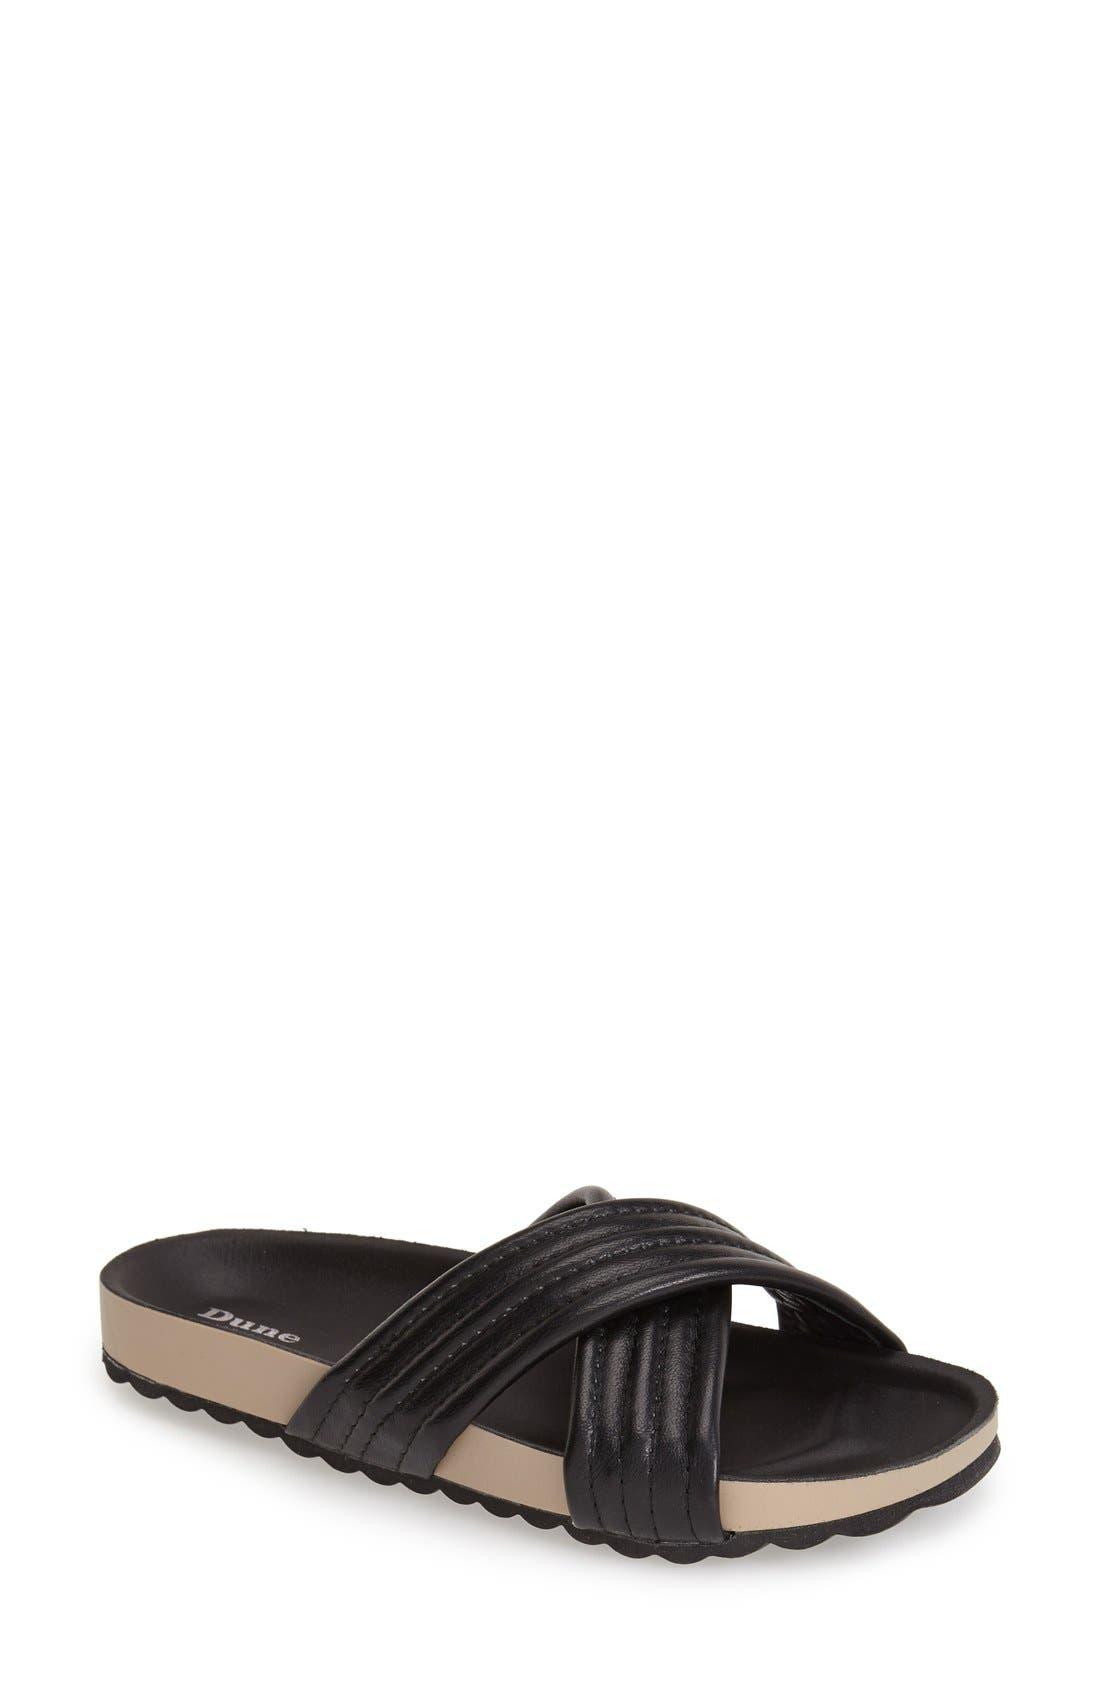 'Jolenes' Leather Slide Sandal,                             Main thumbnail 1, color,                             002